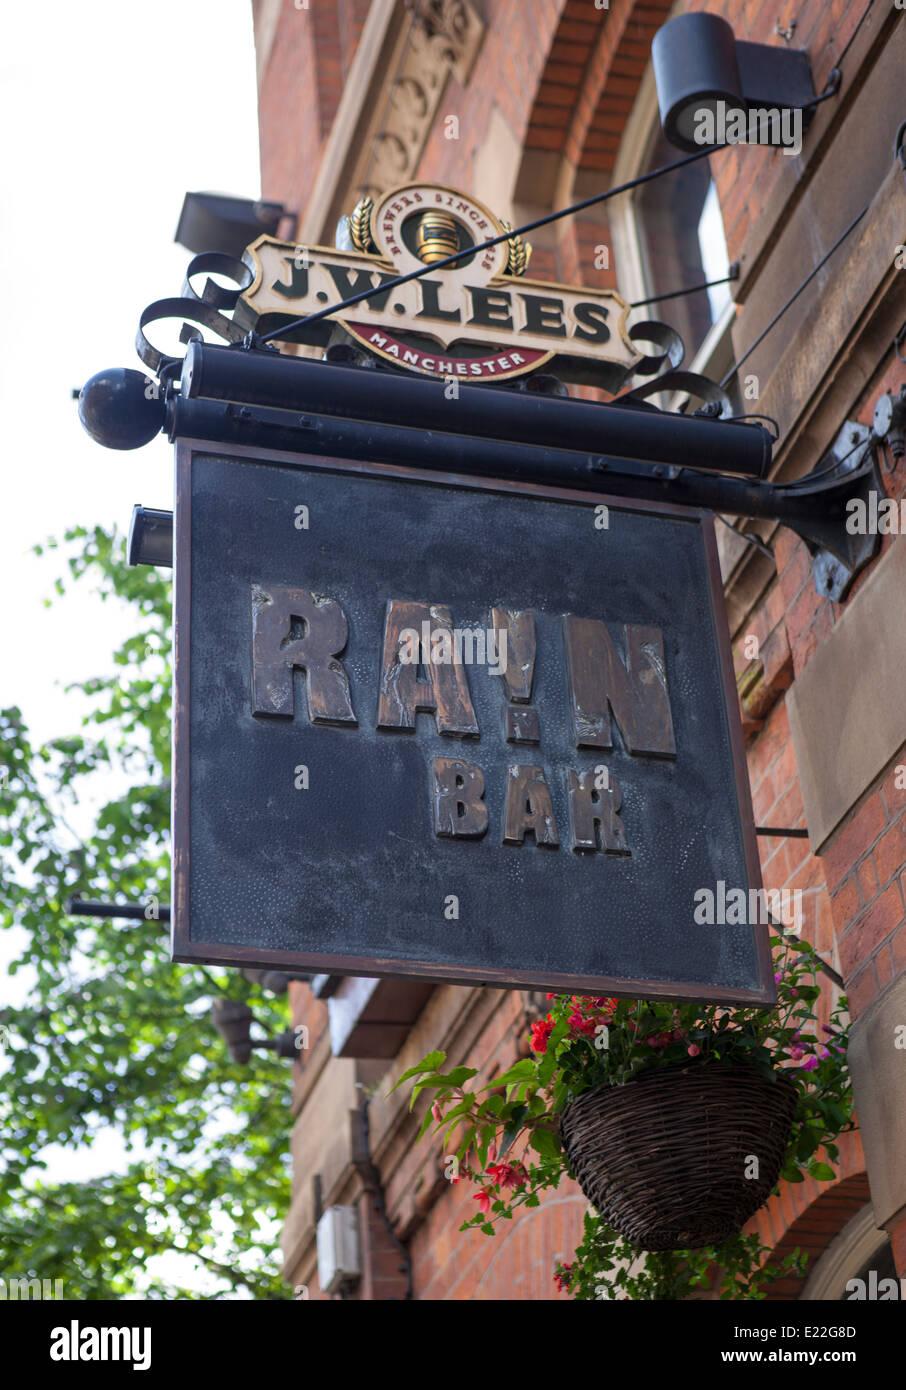 J W Lees Rain Bar Hotel lettered metal hanging pub sign, Great Egerton Street, Manchester City Centre, UK - Stock Image